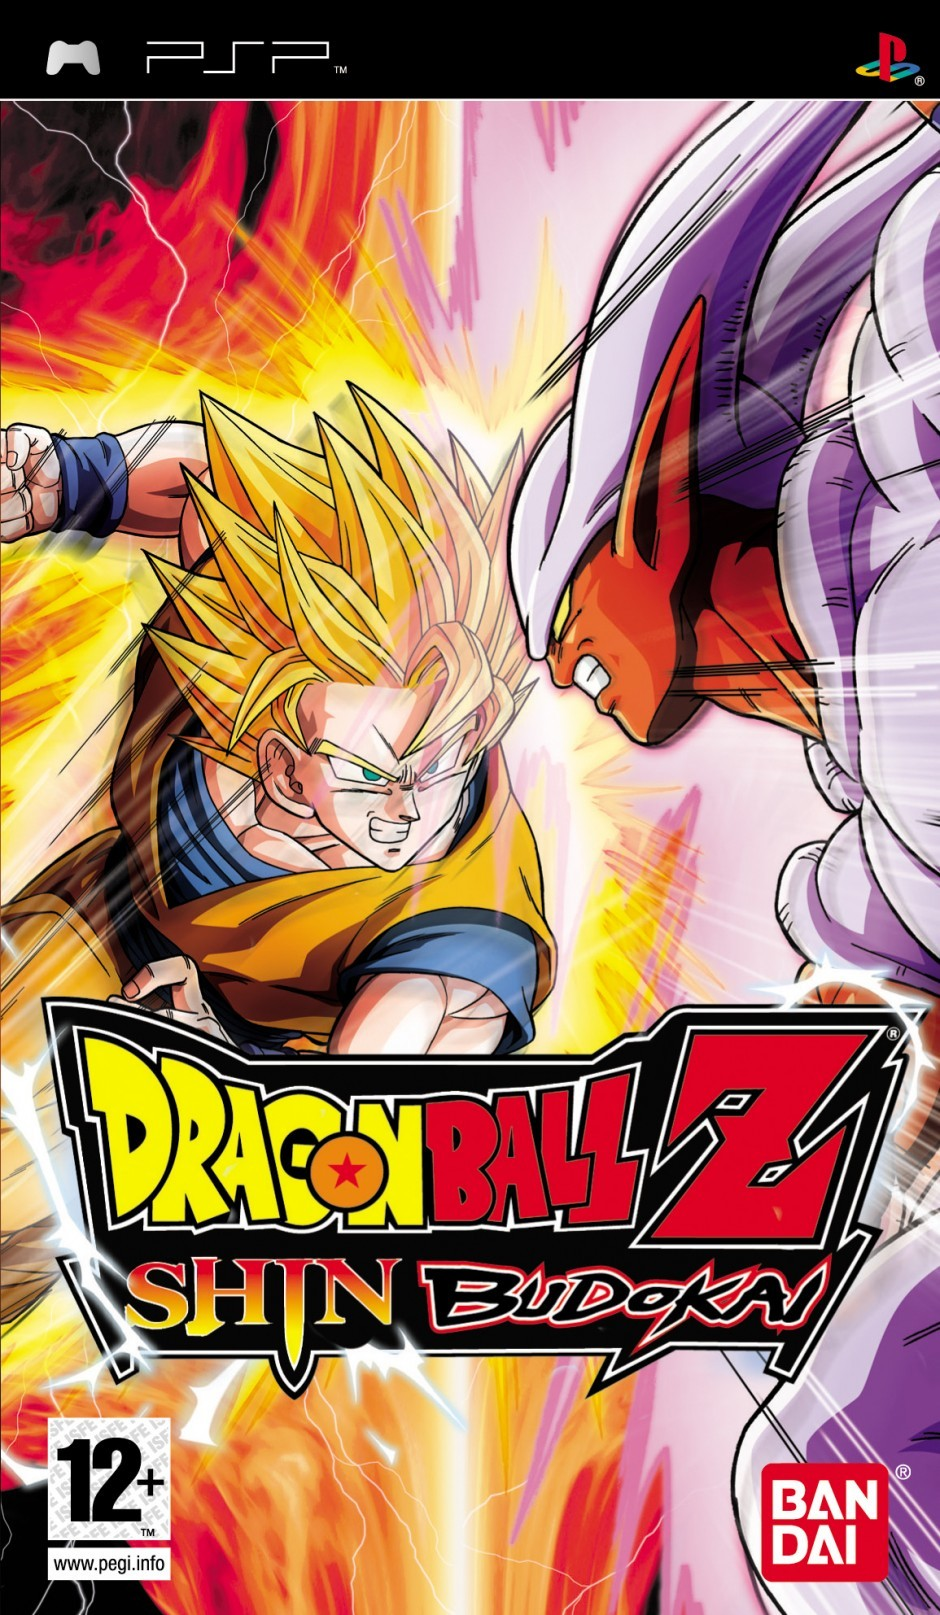 Astuces Dragon Ball Z : Shin Budokai